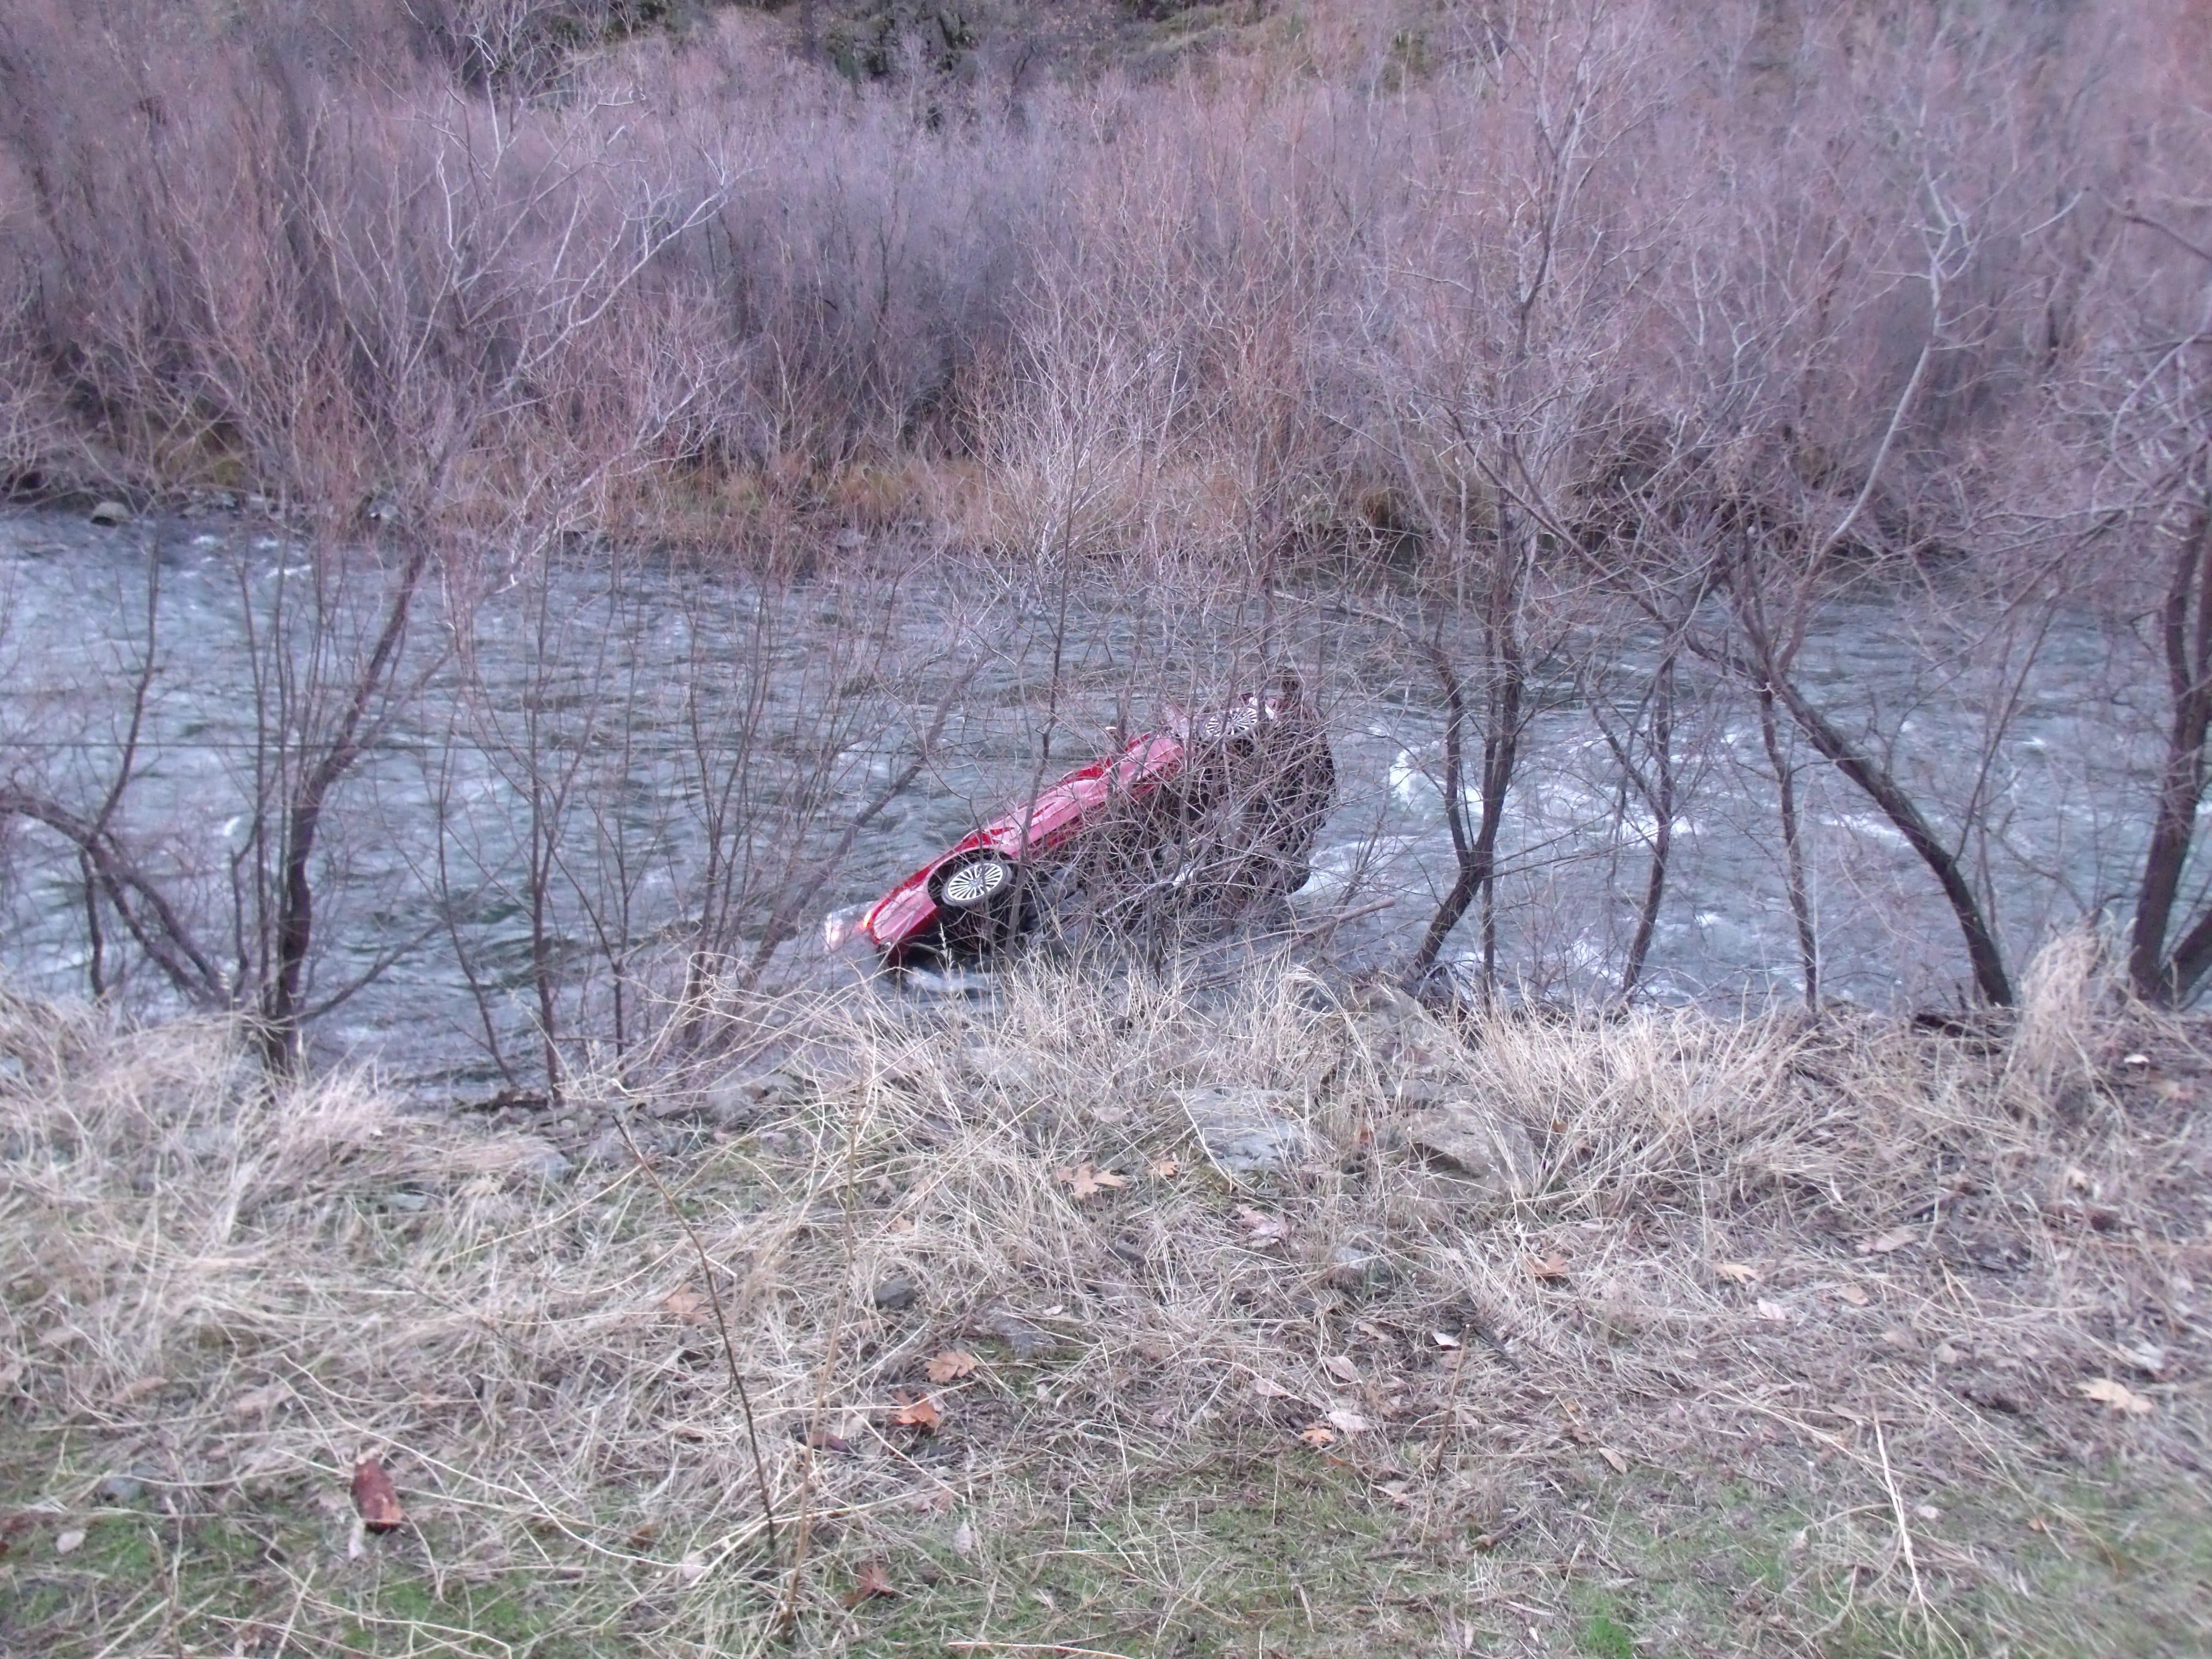 Man survives five hours in frigid river after crashing